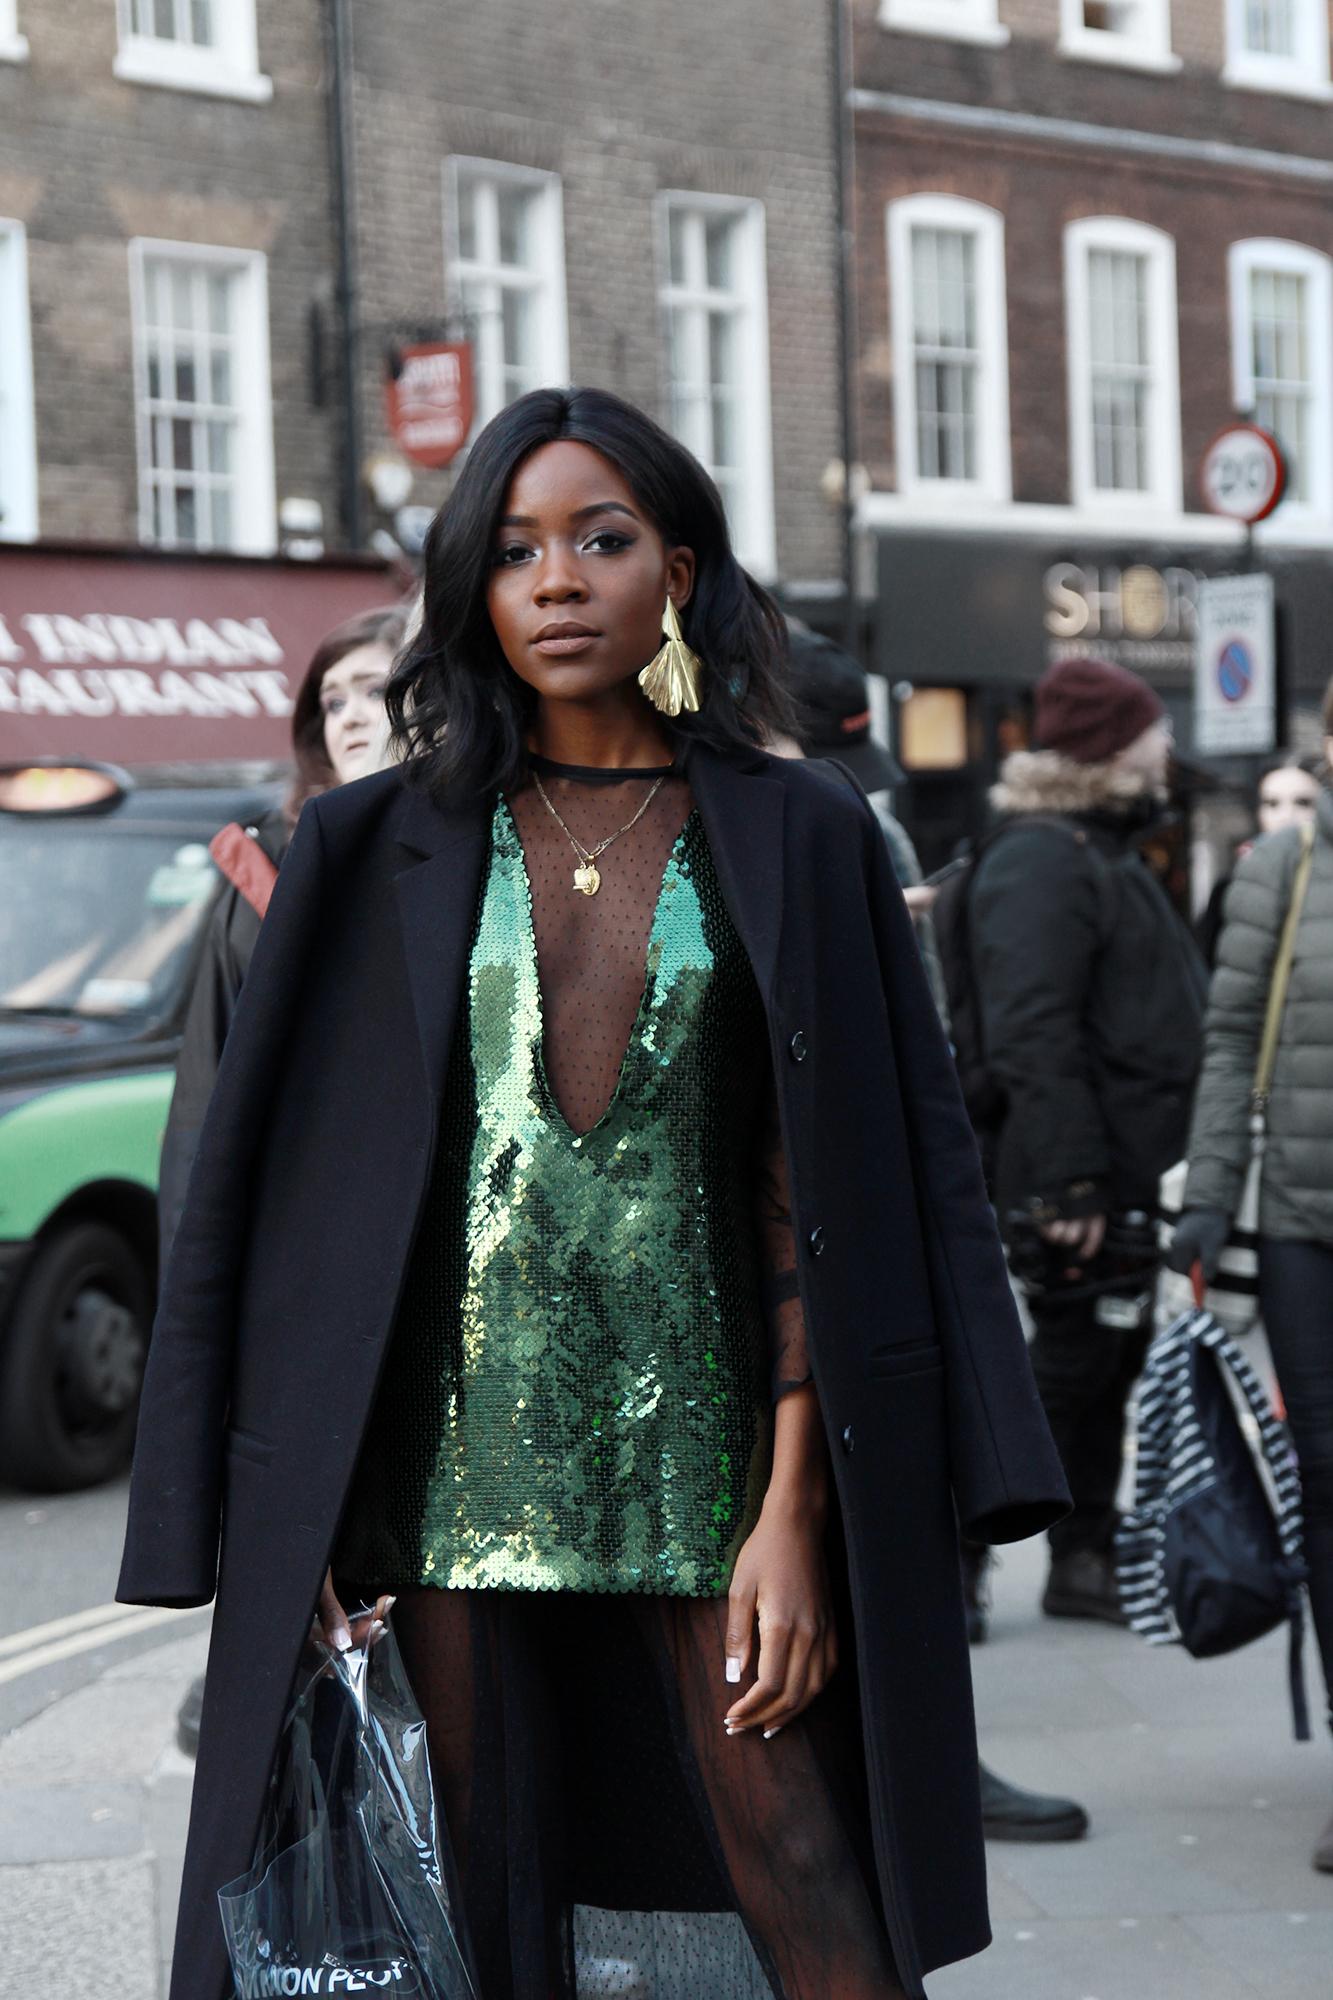 london-fashion-week-day-2